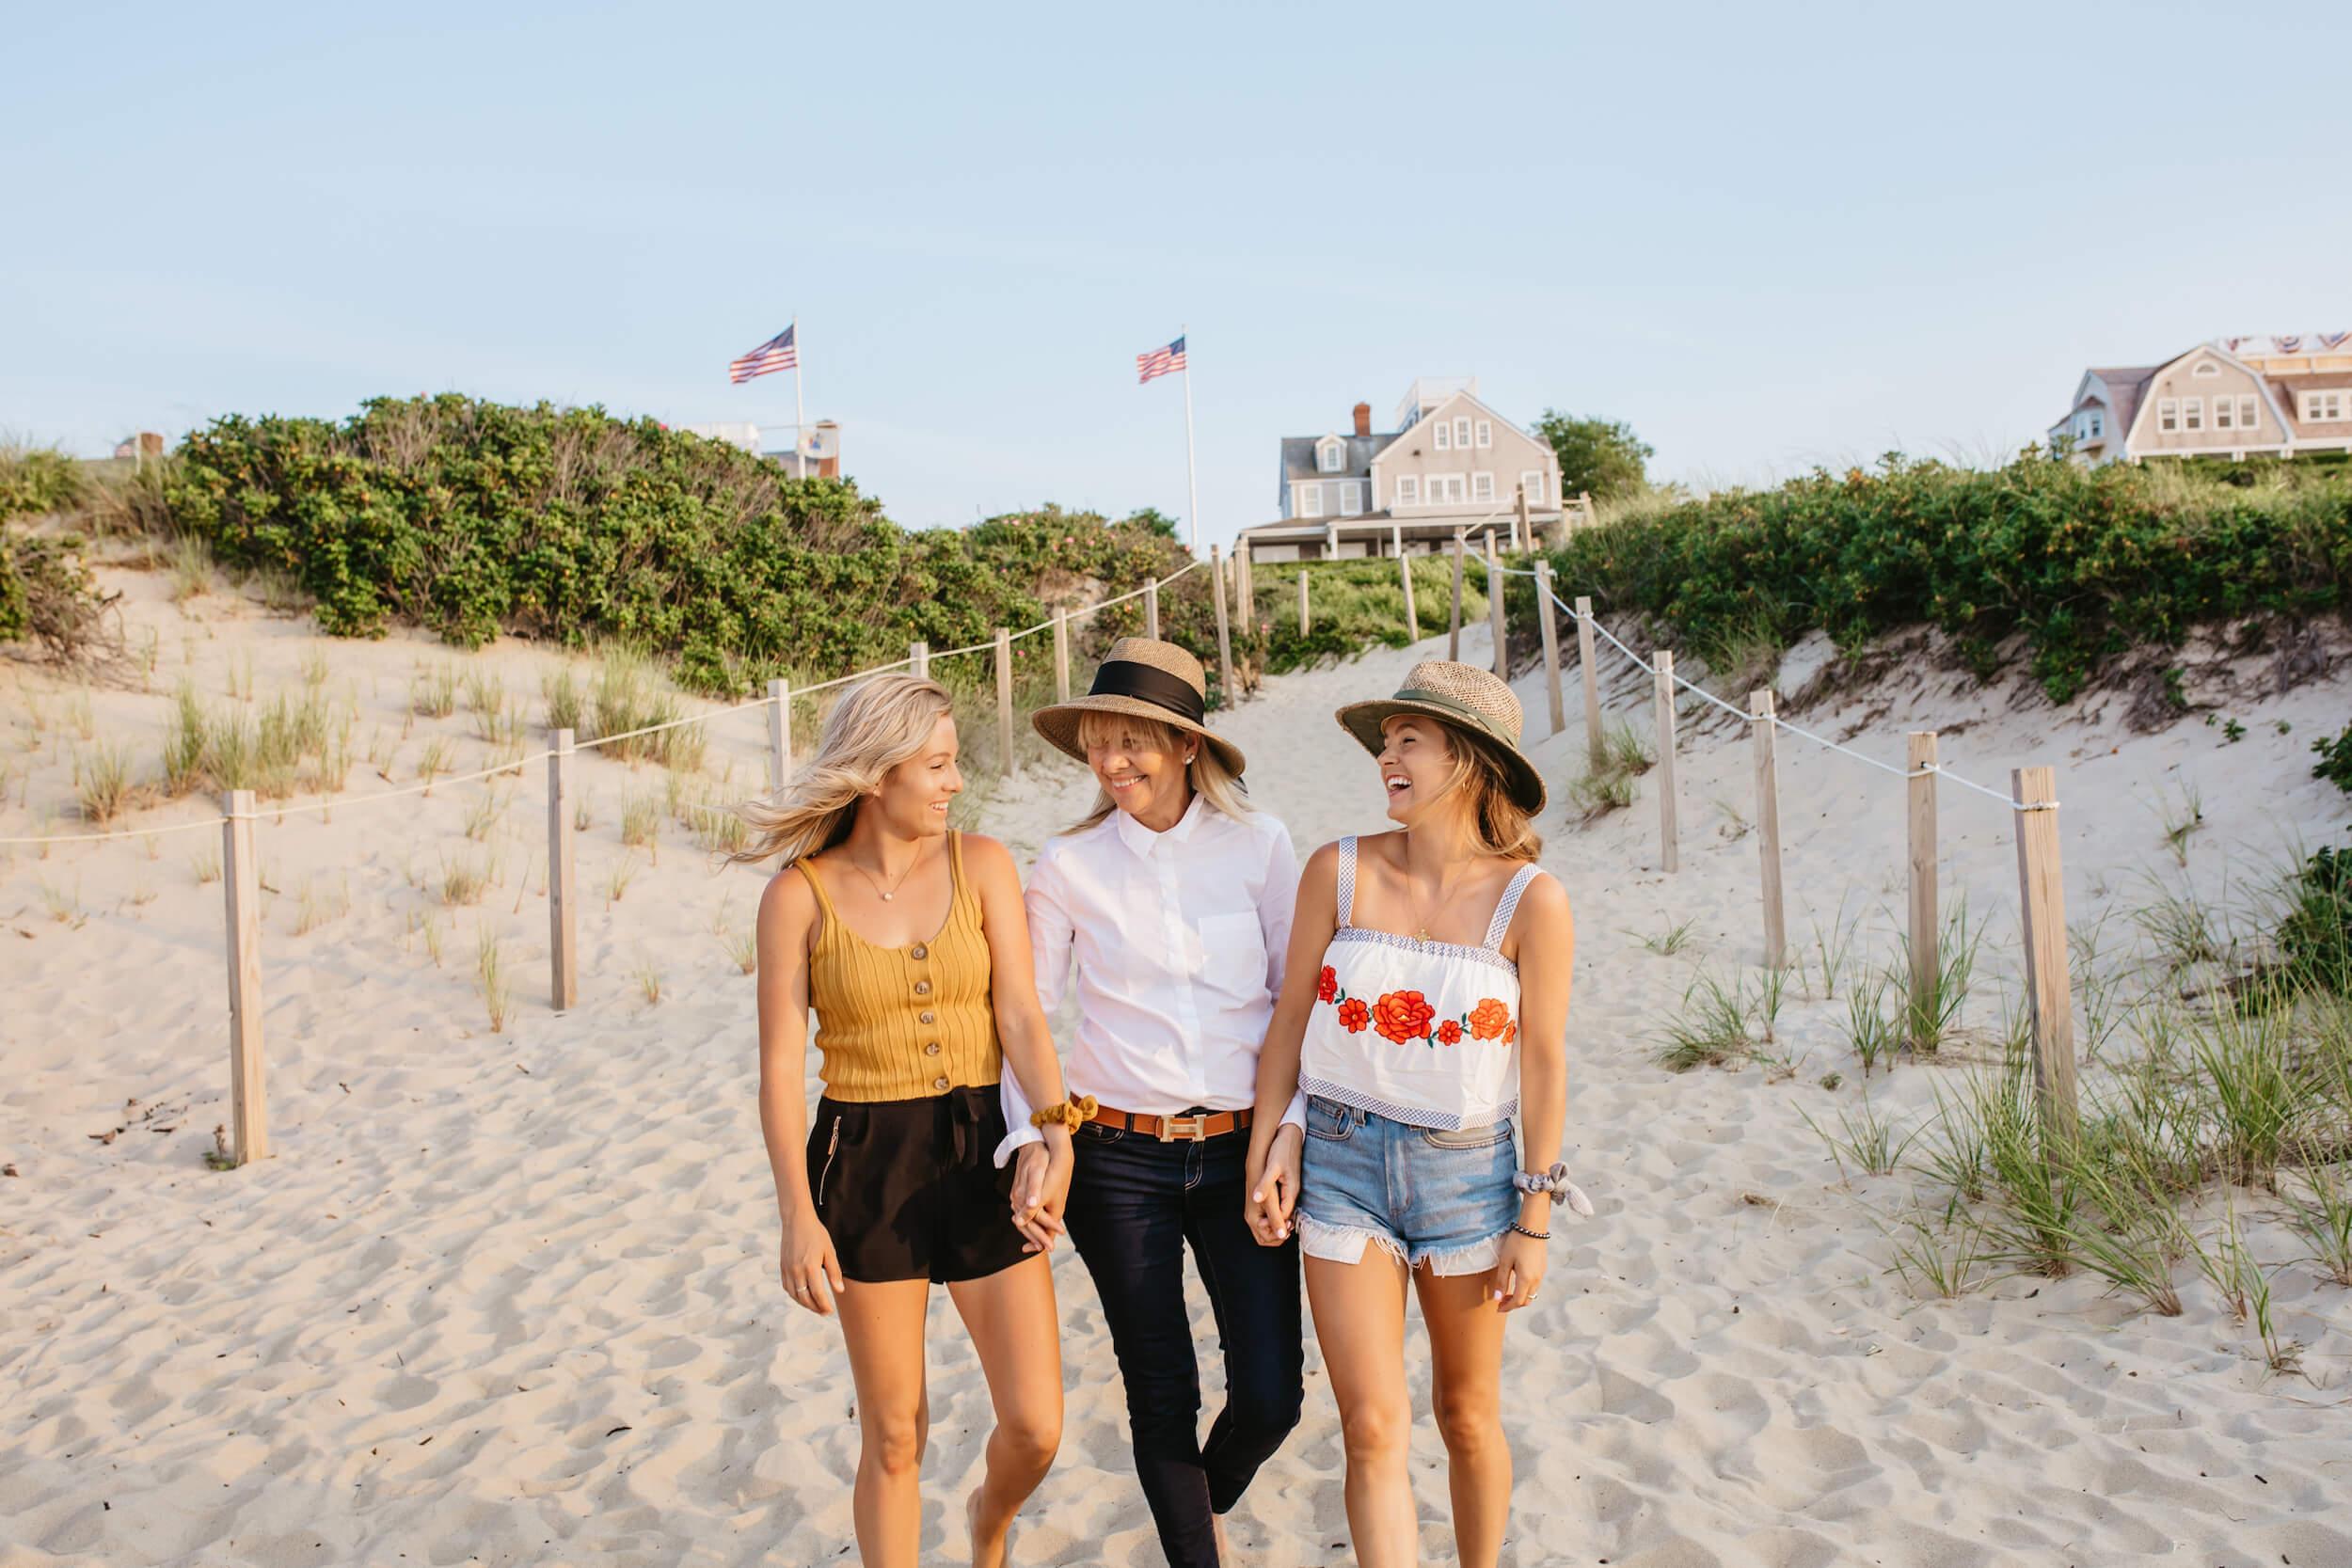 nantucket-07-14-2019-family-trip-10_original